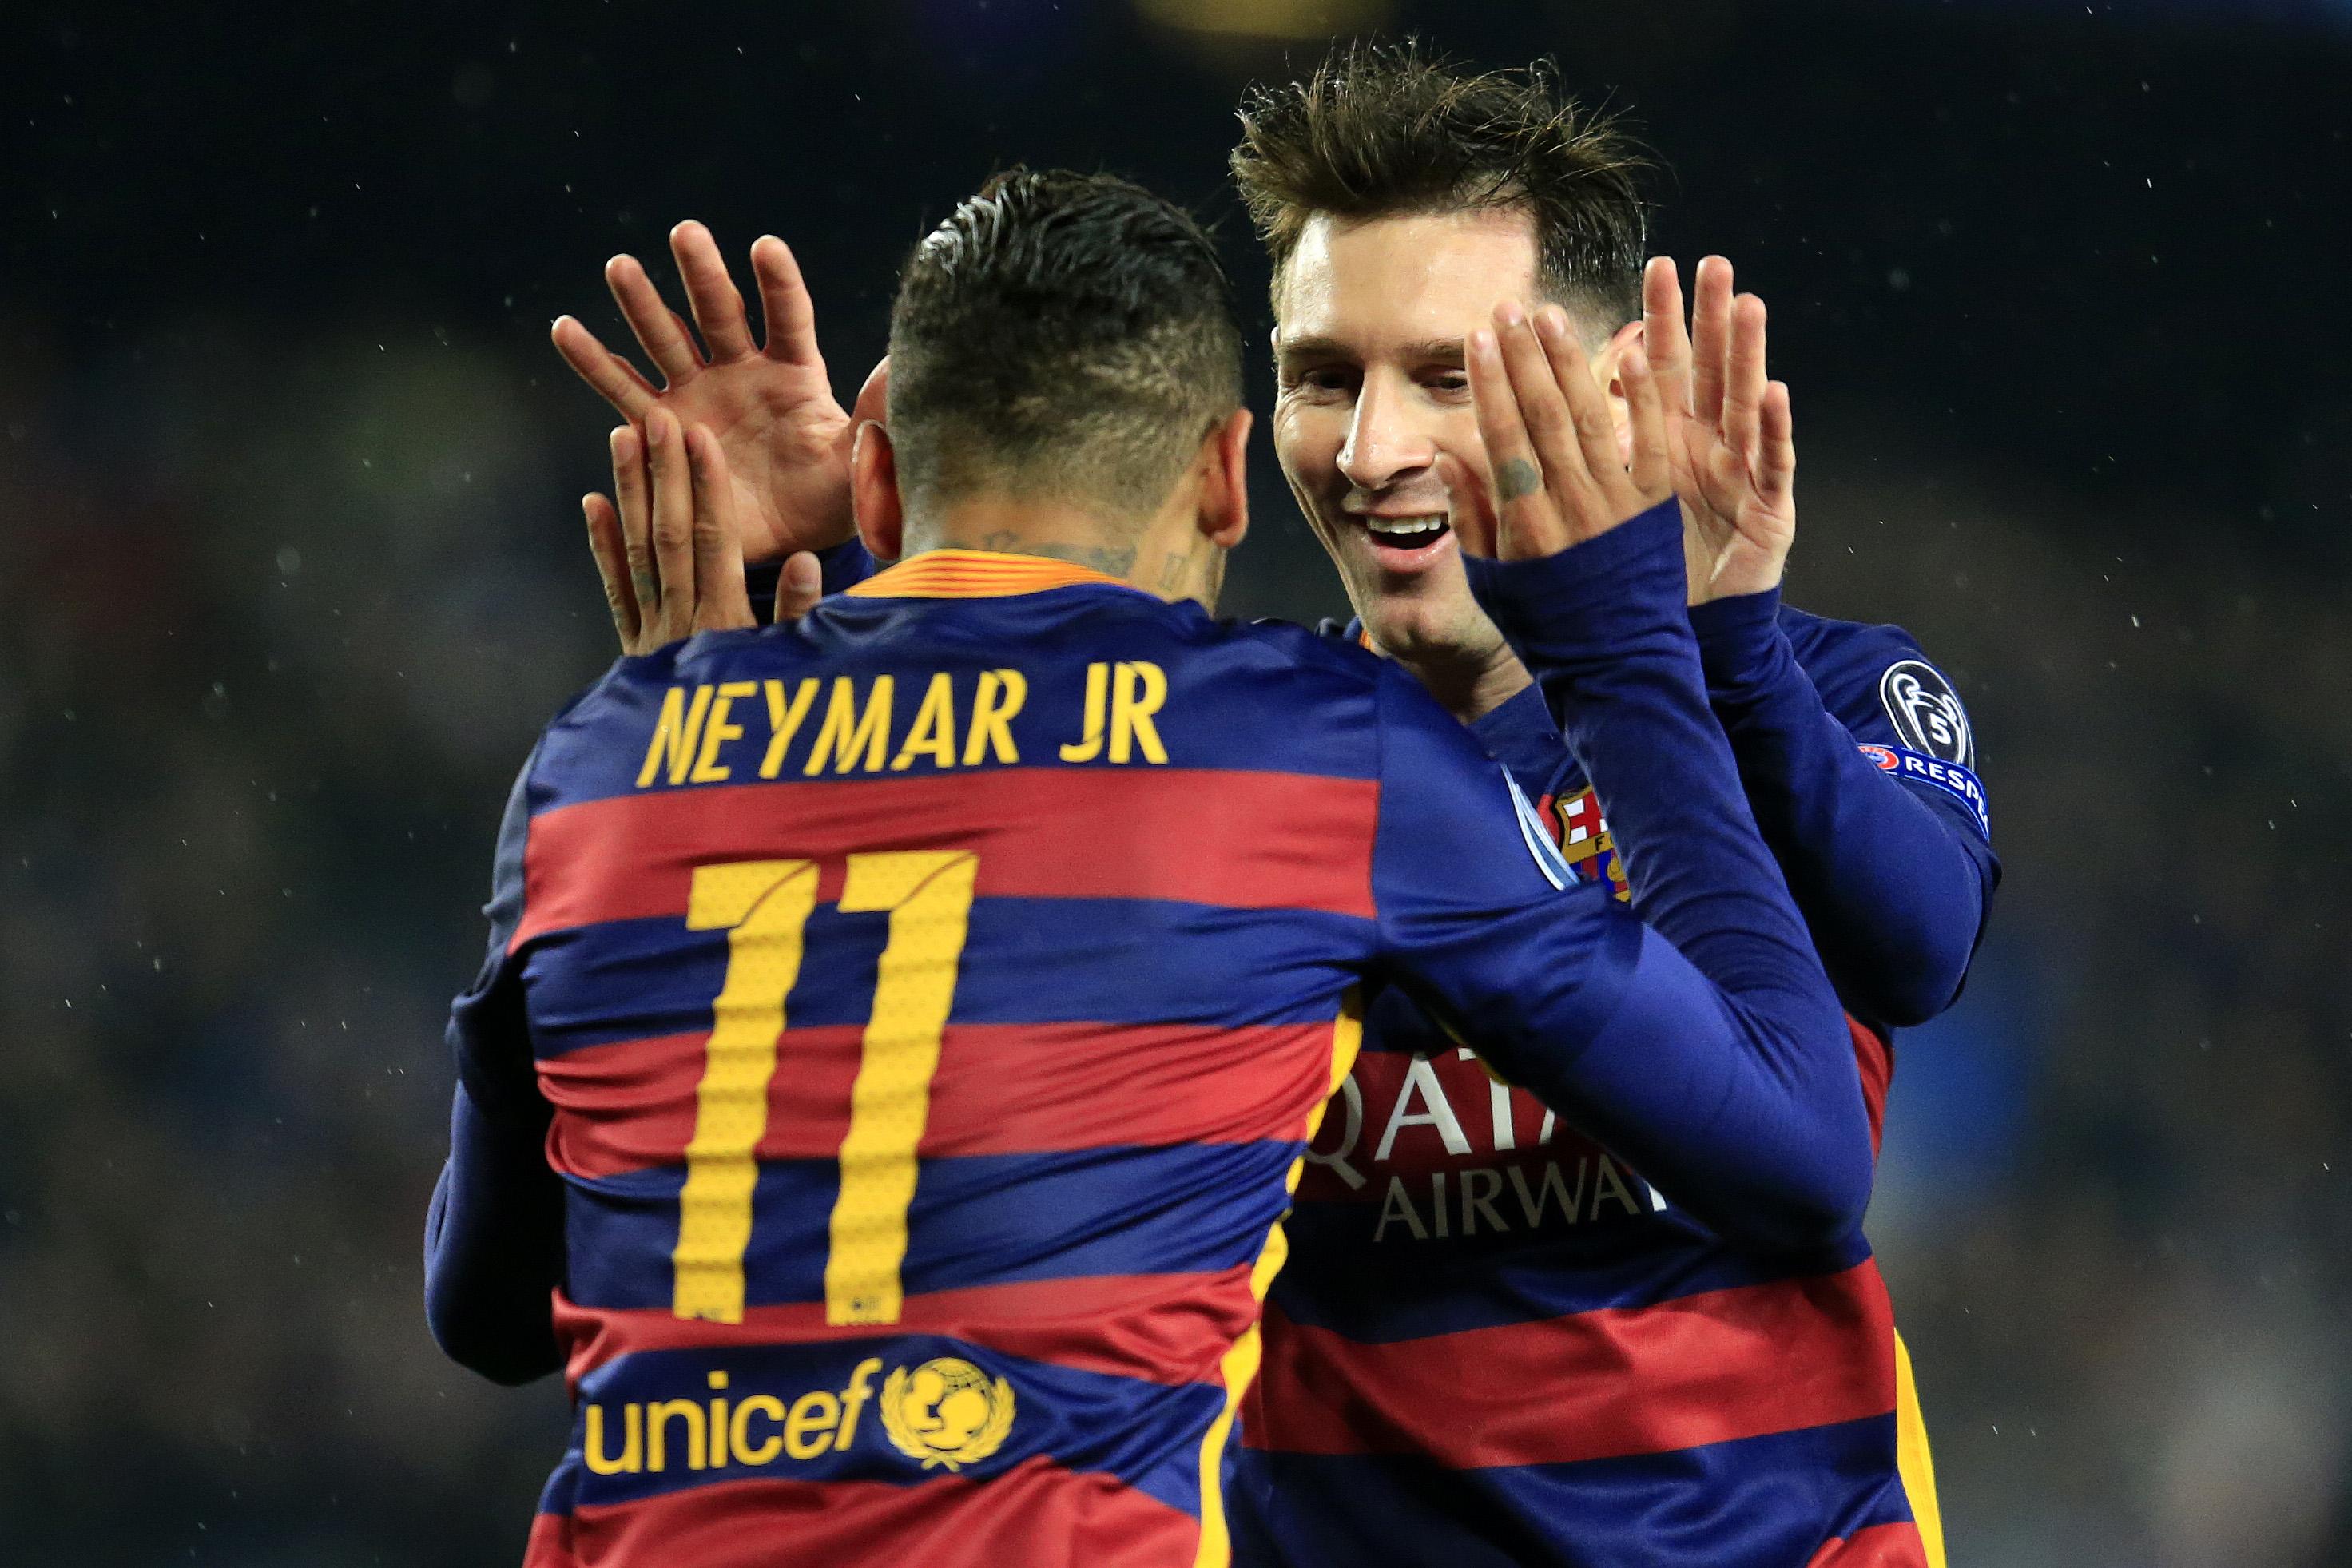 real madrid, barcelona, clasico, barca madrid Score, Stats, Highlights, Video, Vine, Twitter, live, update, goal scorer, who scored, goals, videos, highlights,